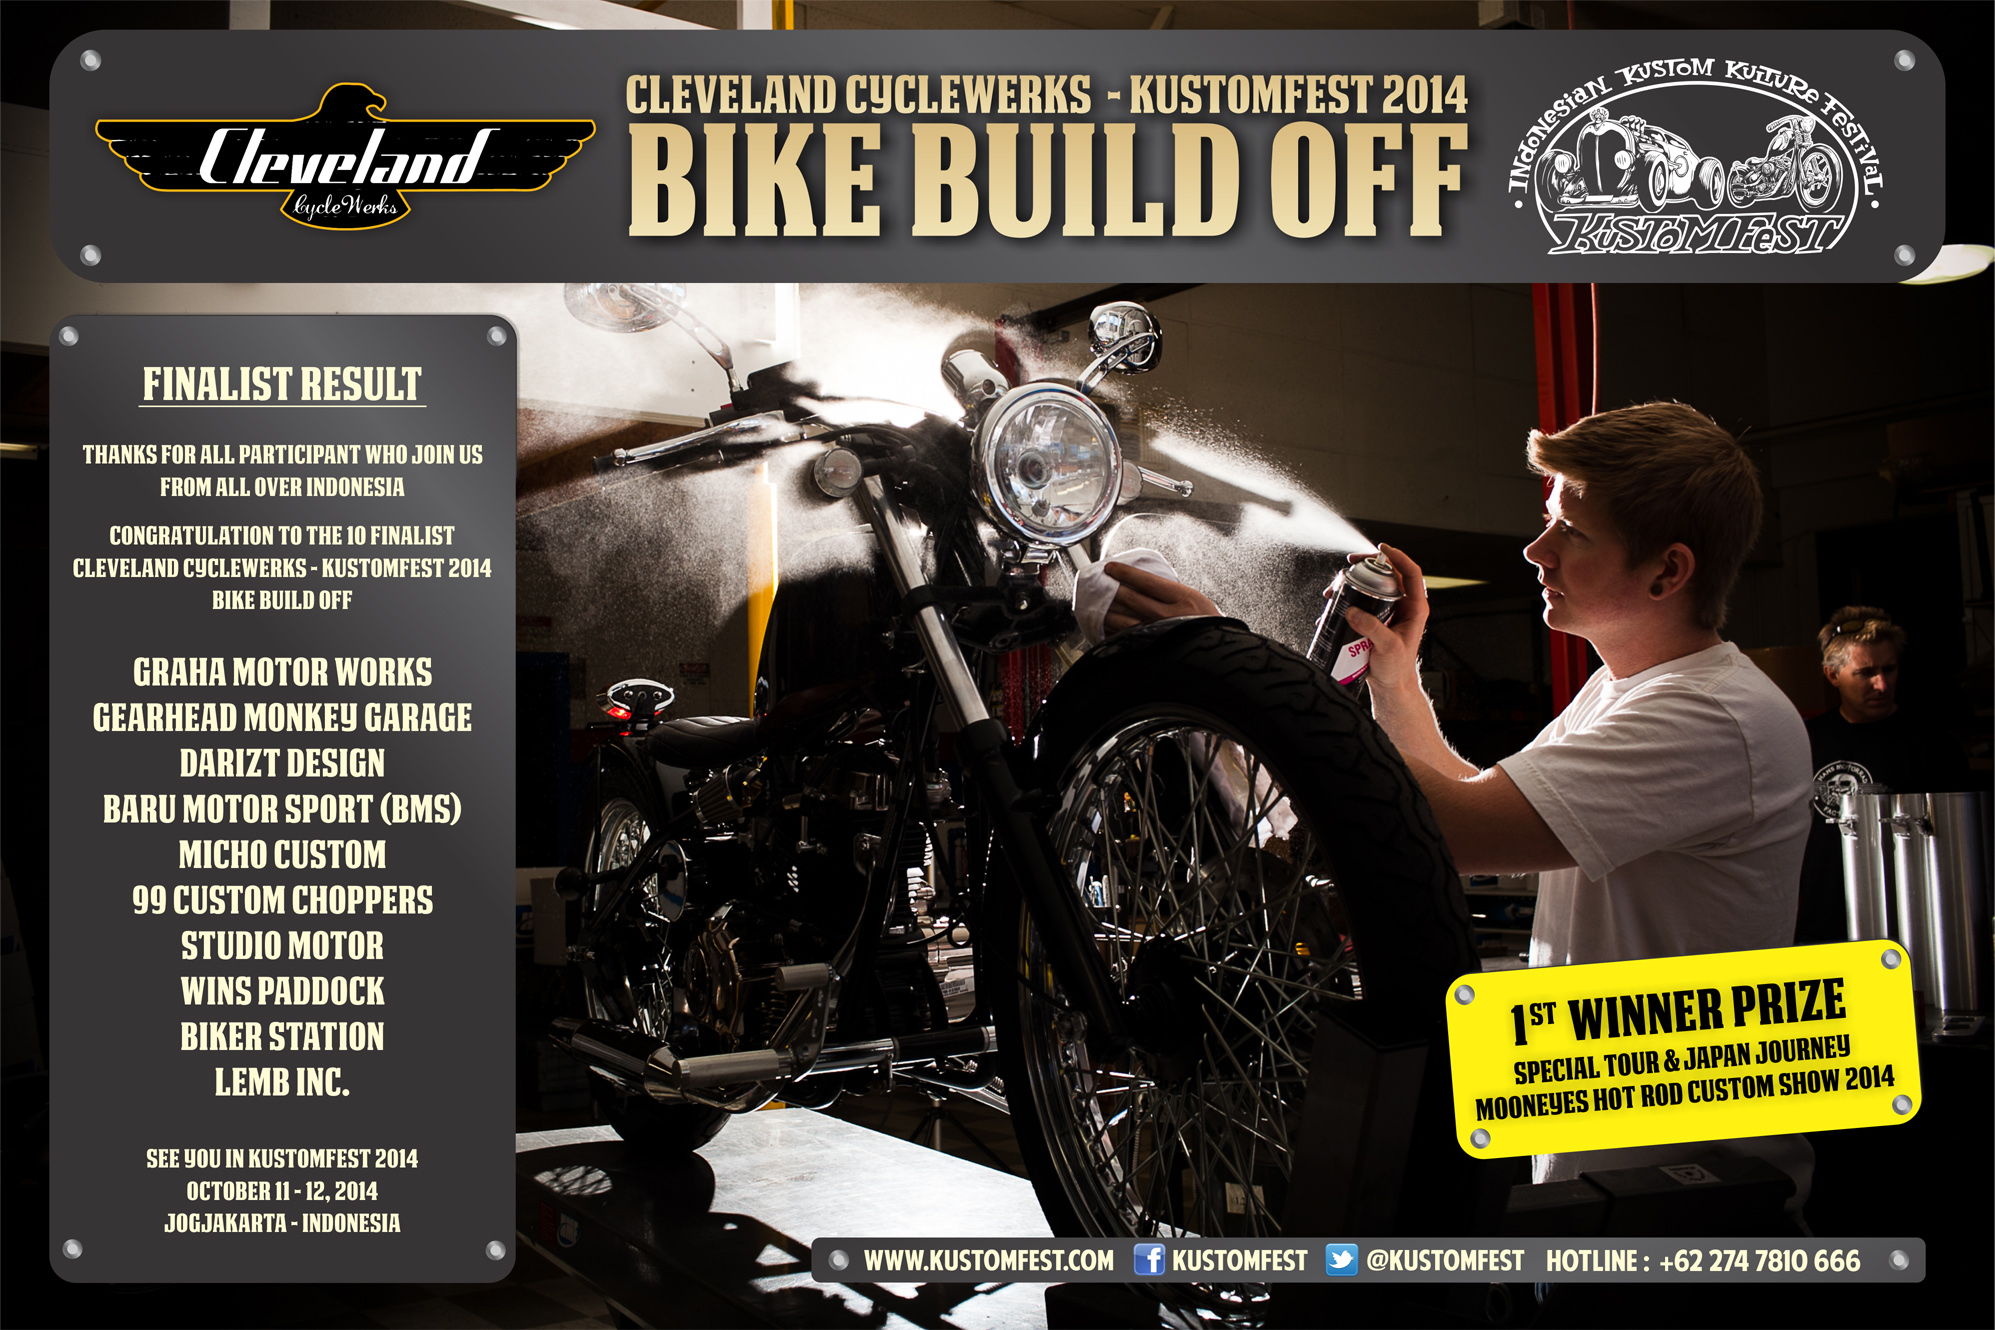 Cleveland CycleWerks Kustomfest 2014 Bike Buildoff